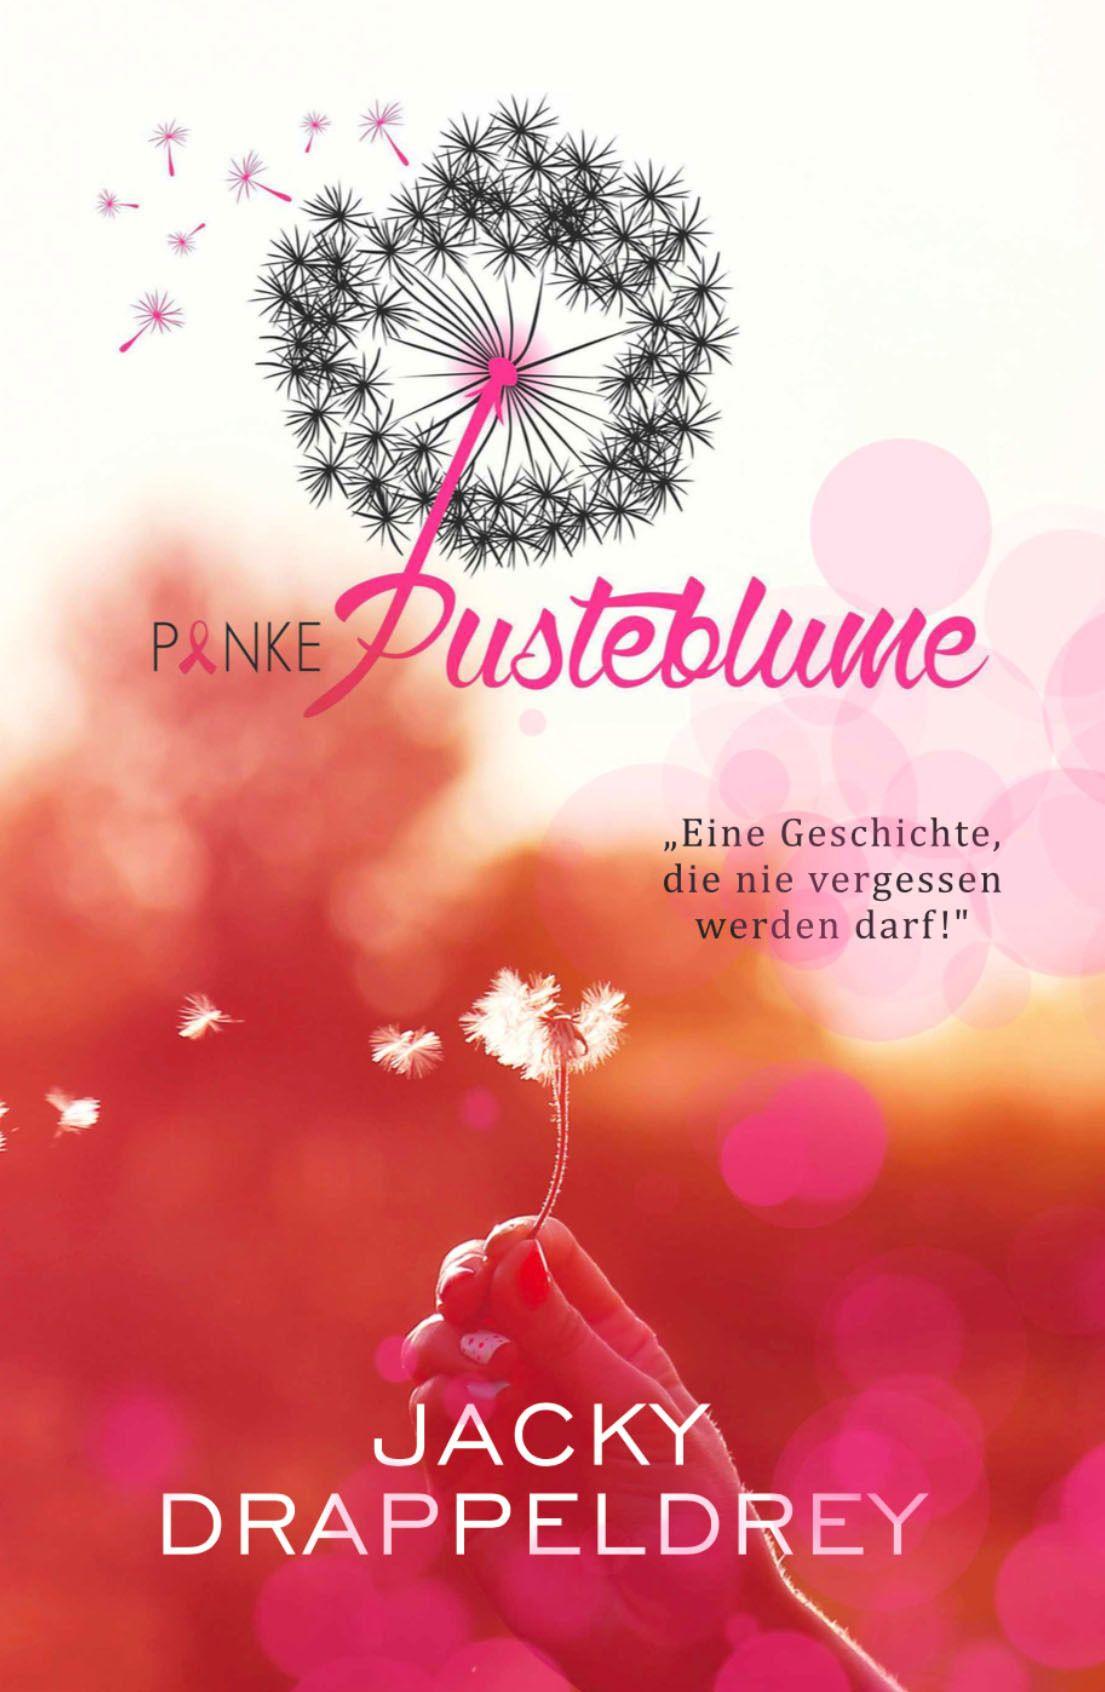 Pinke Pusteblume Cover Large